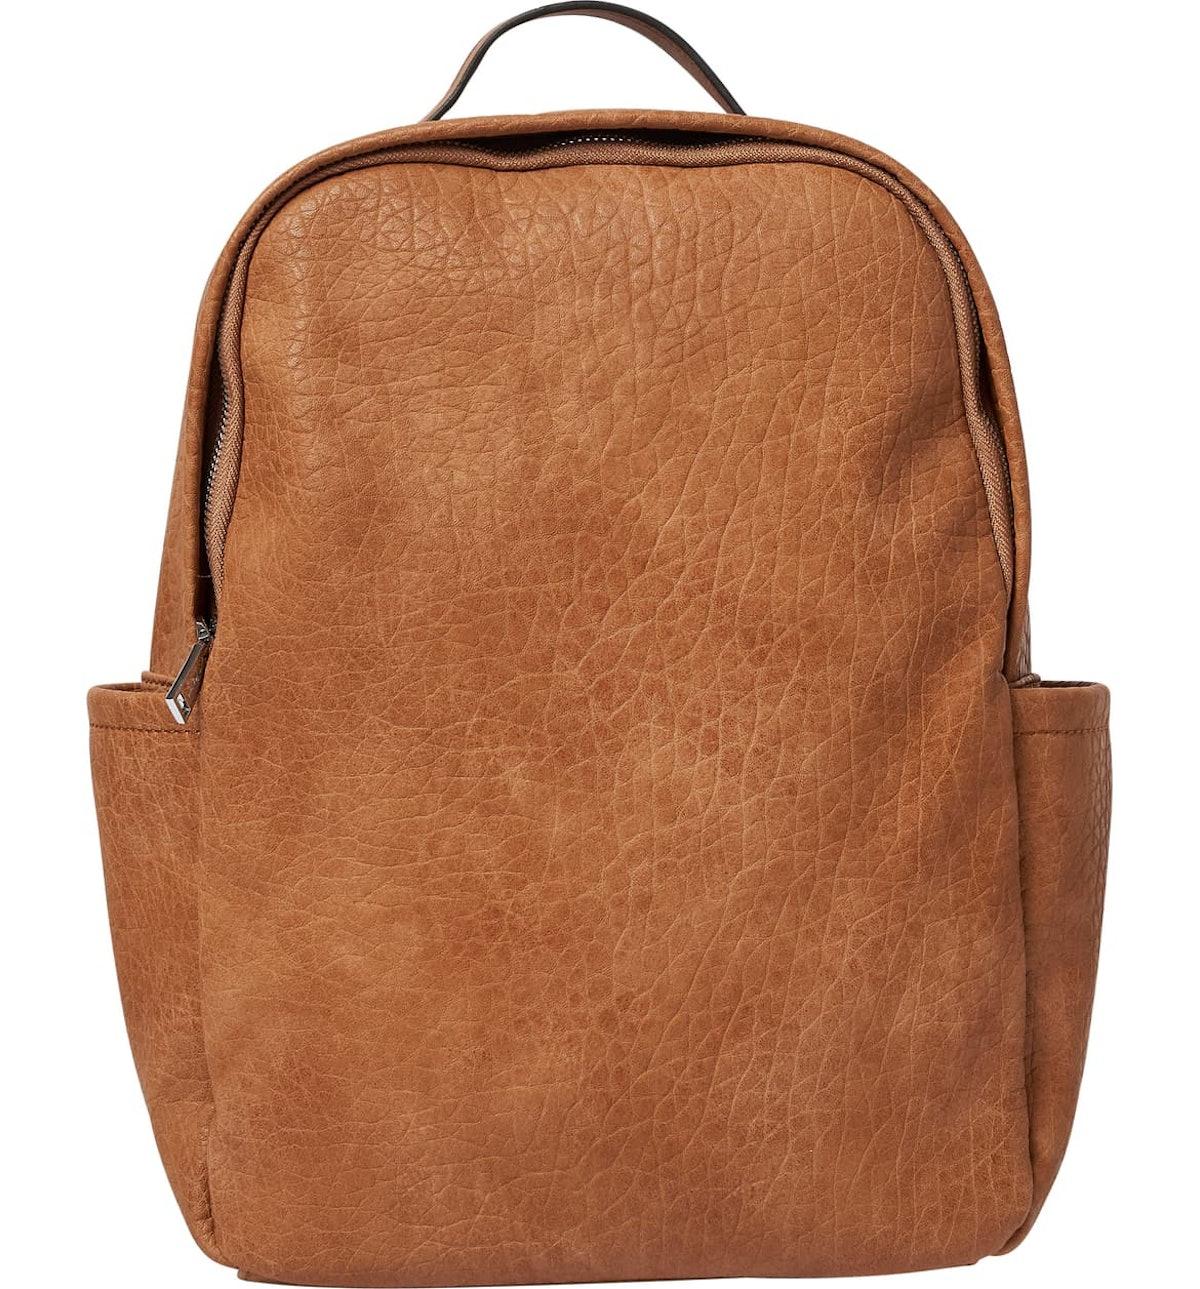 Urban Originals Train Textured Vegan Leather Backpack